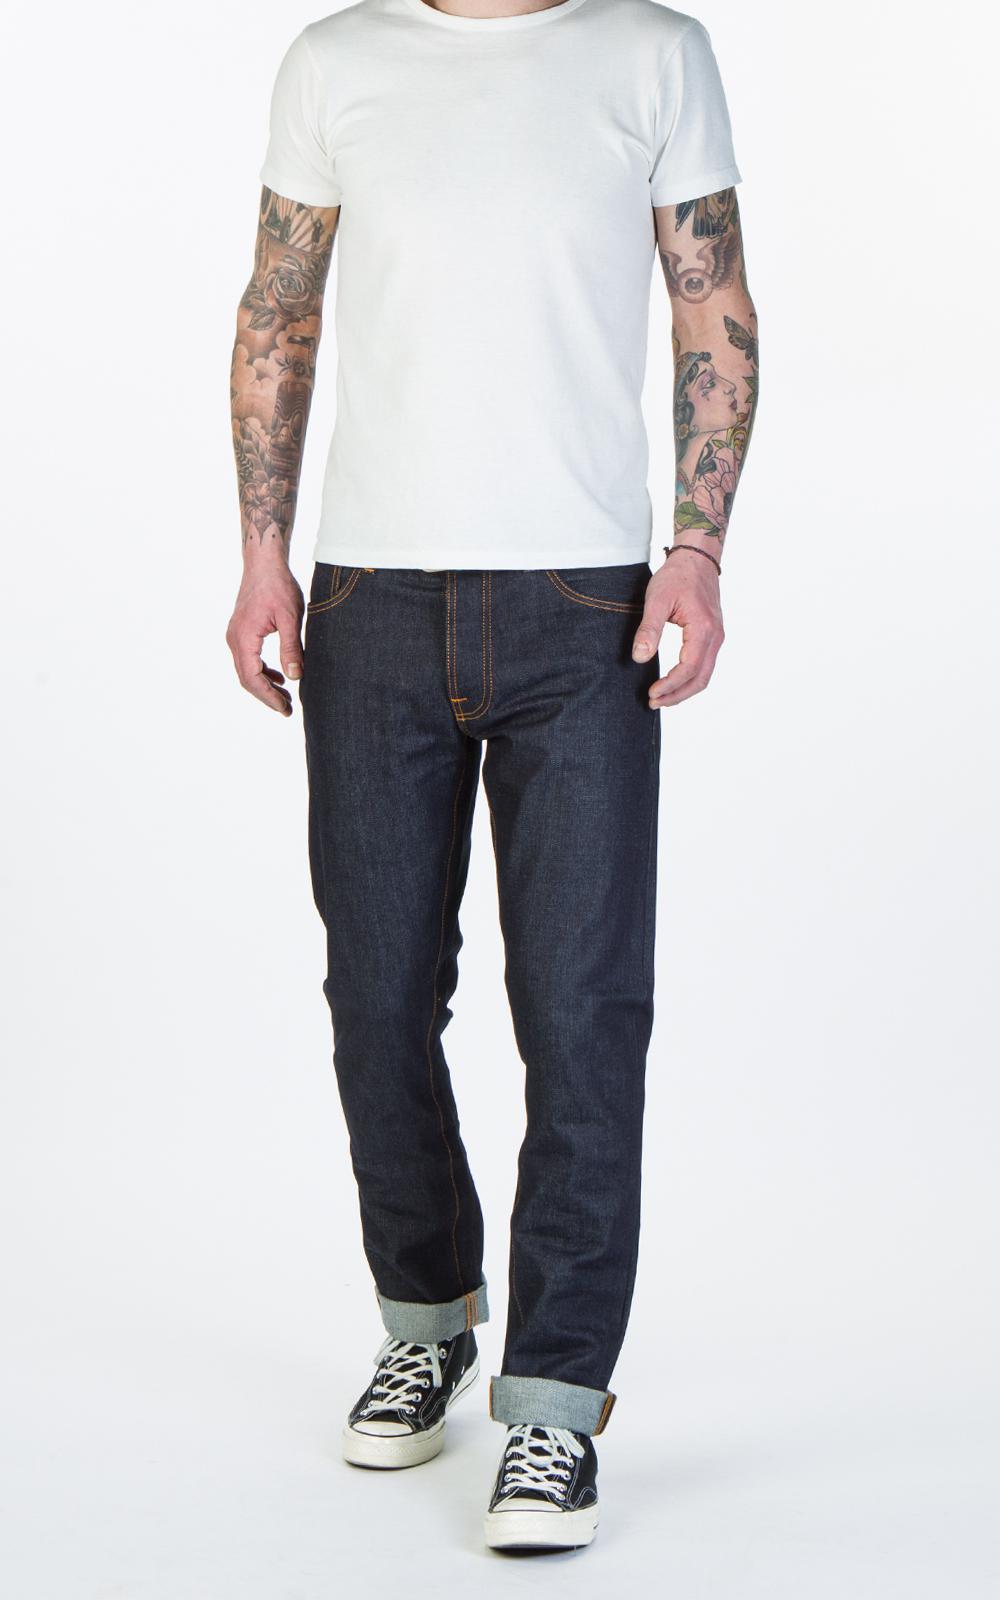 e49b7dc7840c4 Lyst - Nudie Jeans Dude Dan Dry Classic Navy 13.5oz in Blue for Men